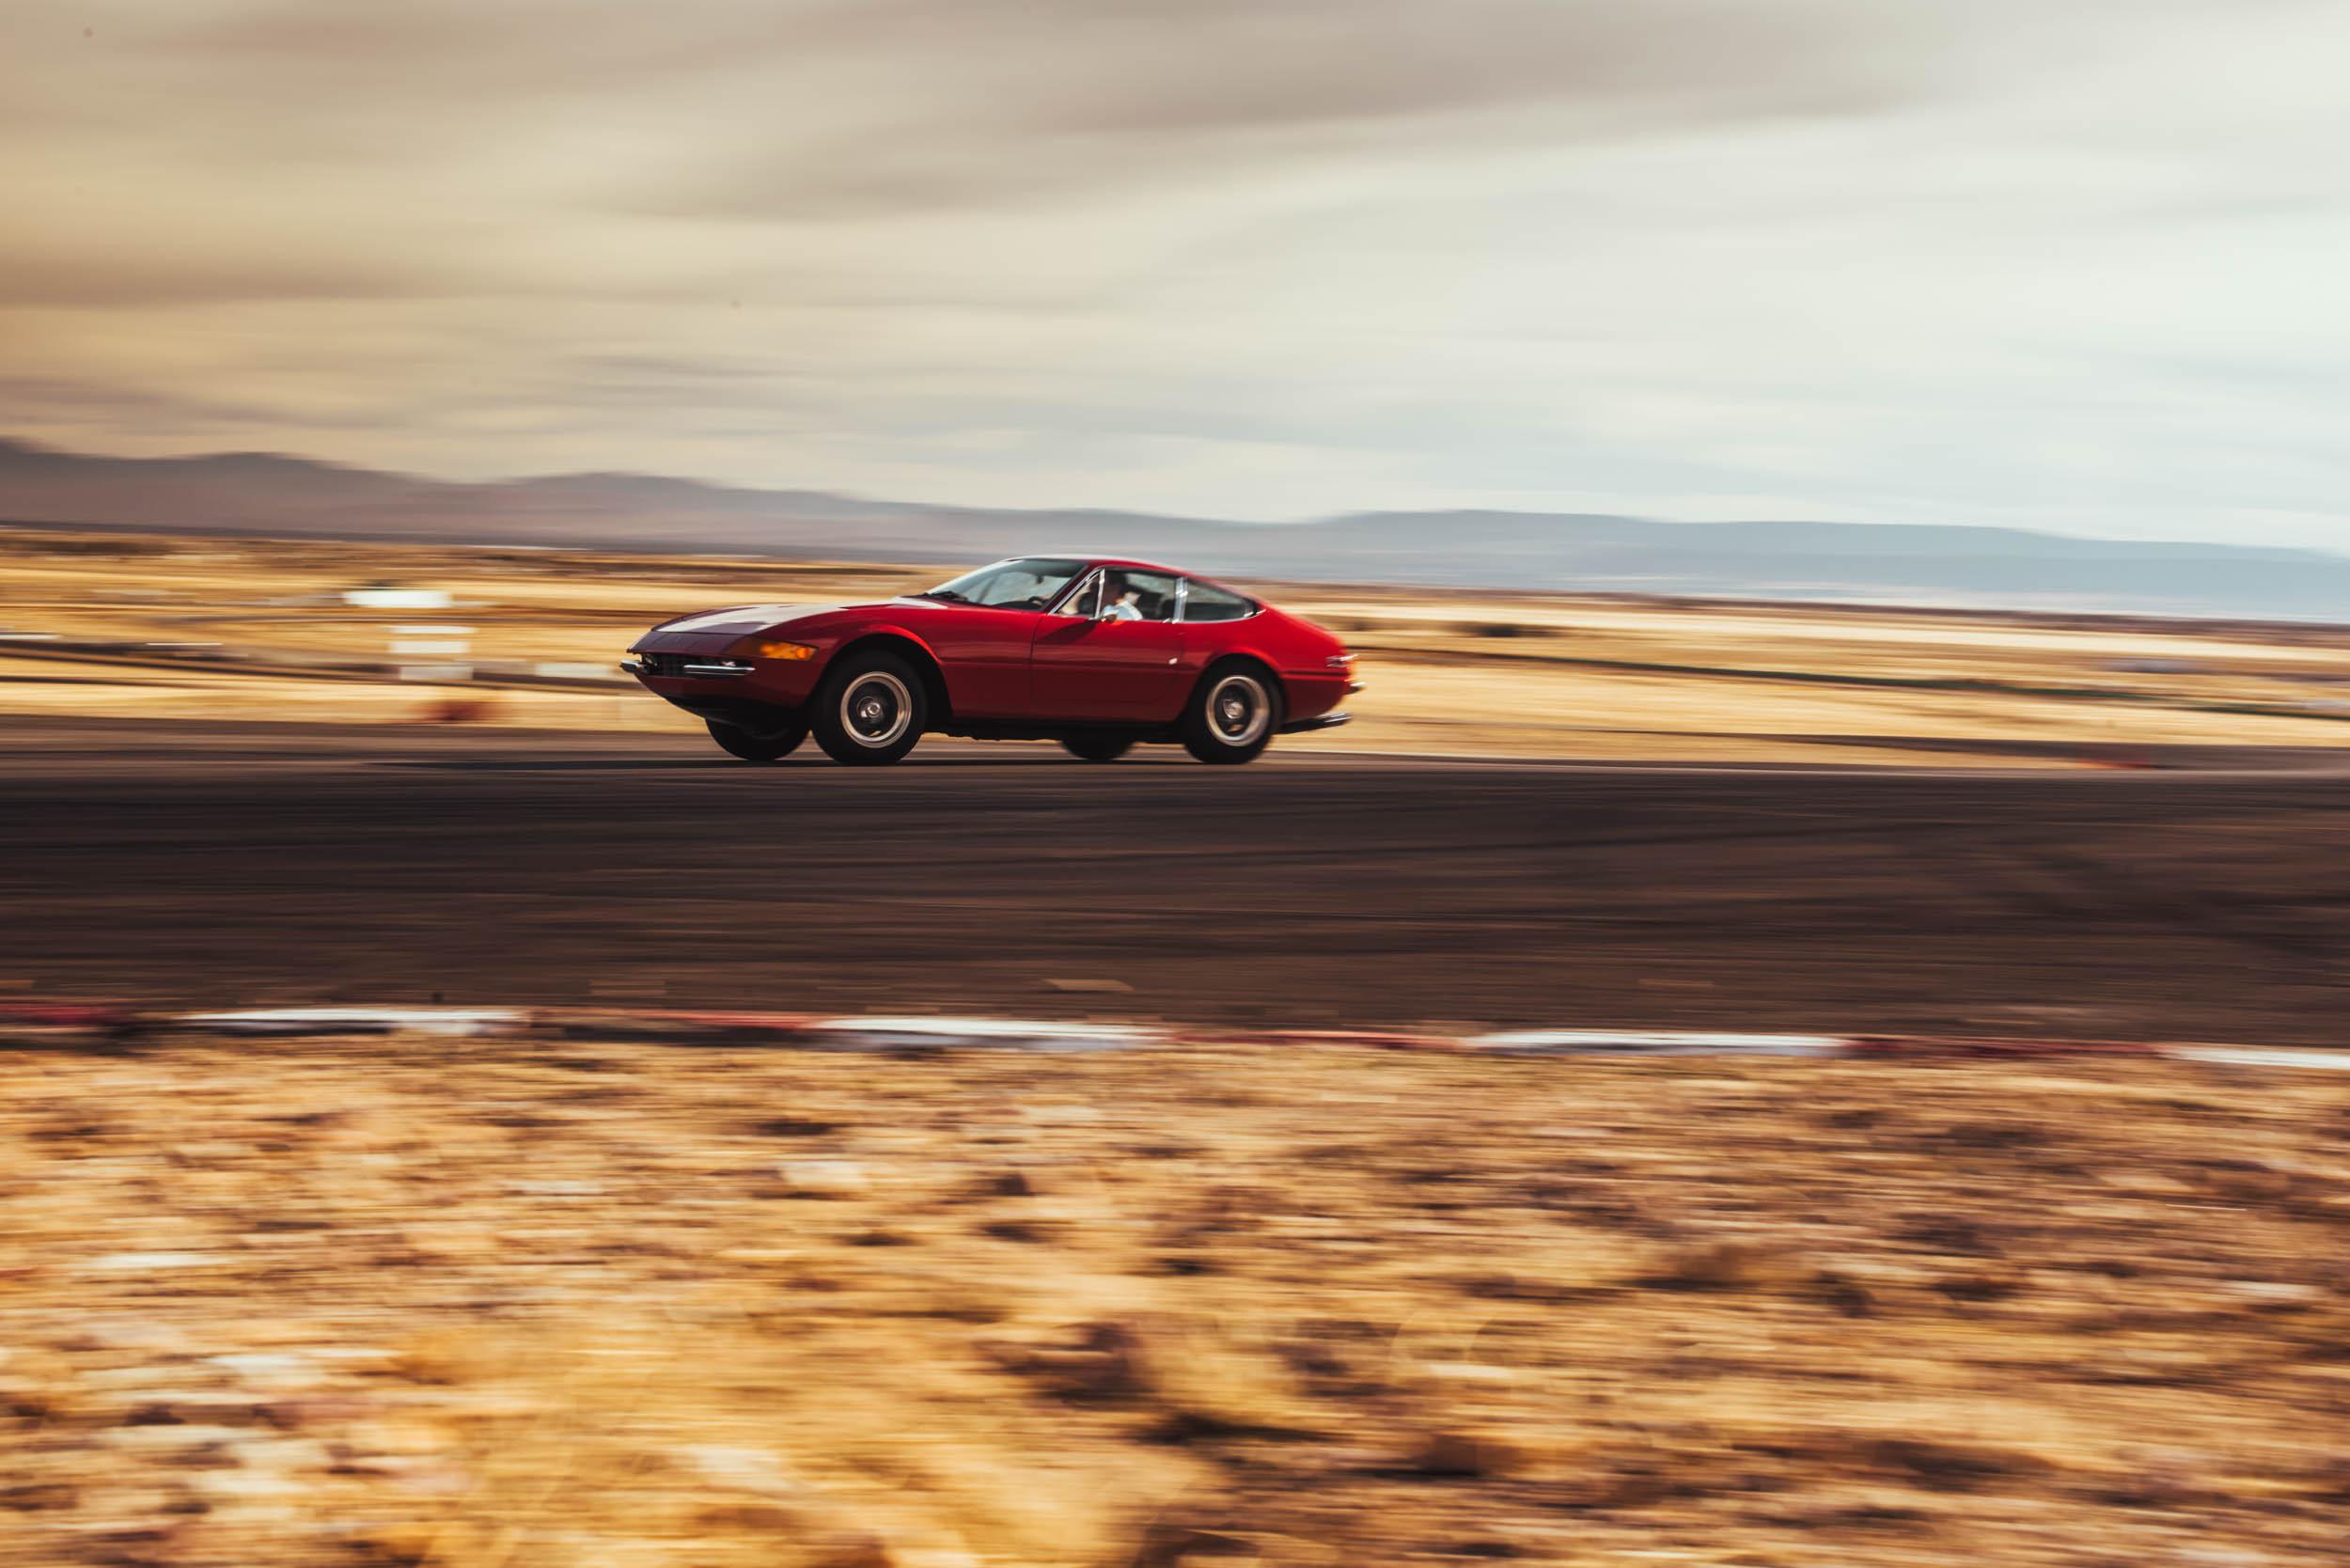 Ferrari Daytona driving